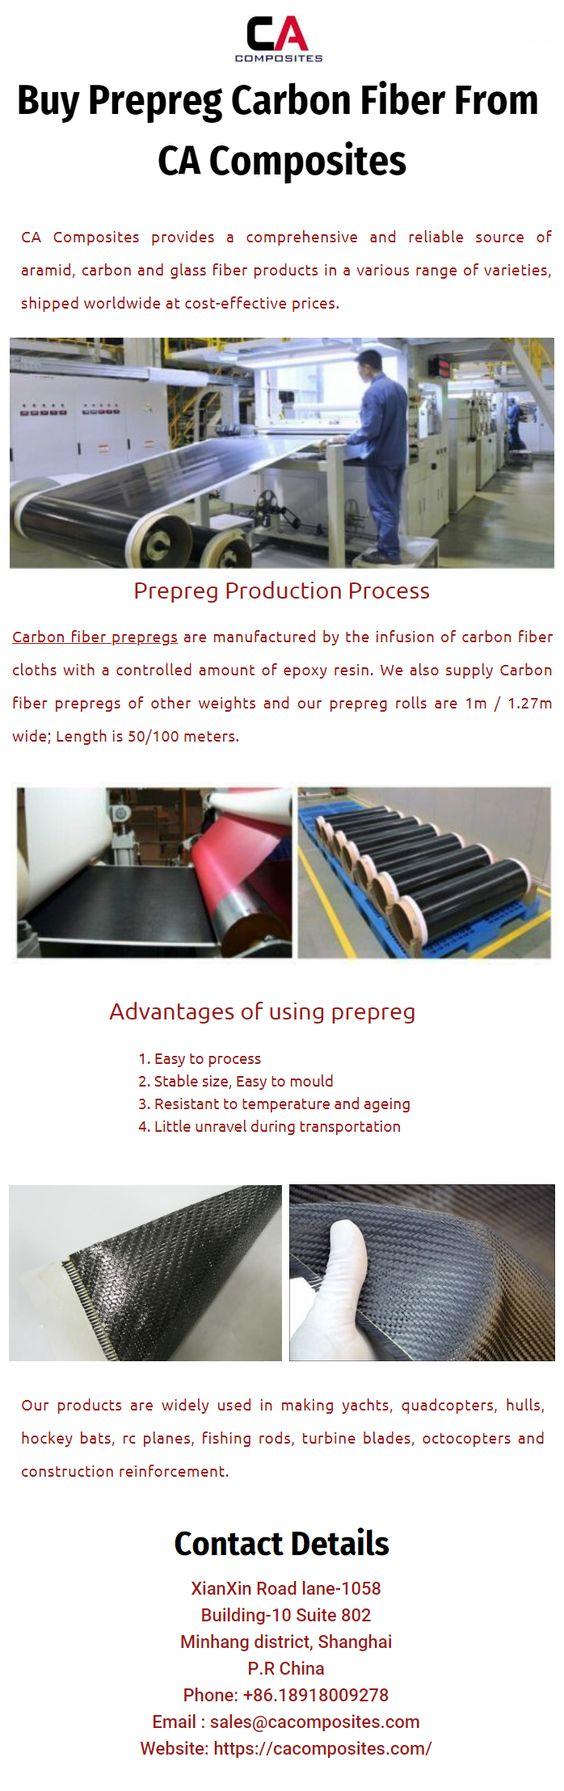 EPOXY RESIN GRP MOULDS ETC PEEL PLY 1m x 1m use WITH CARBON FIBRE